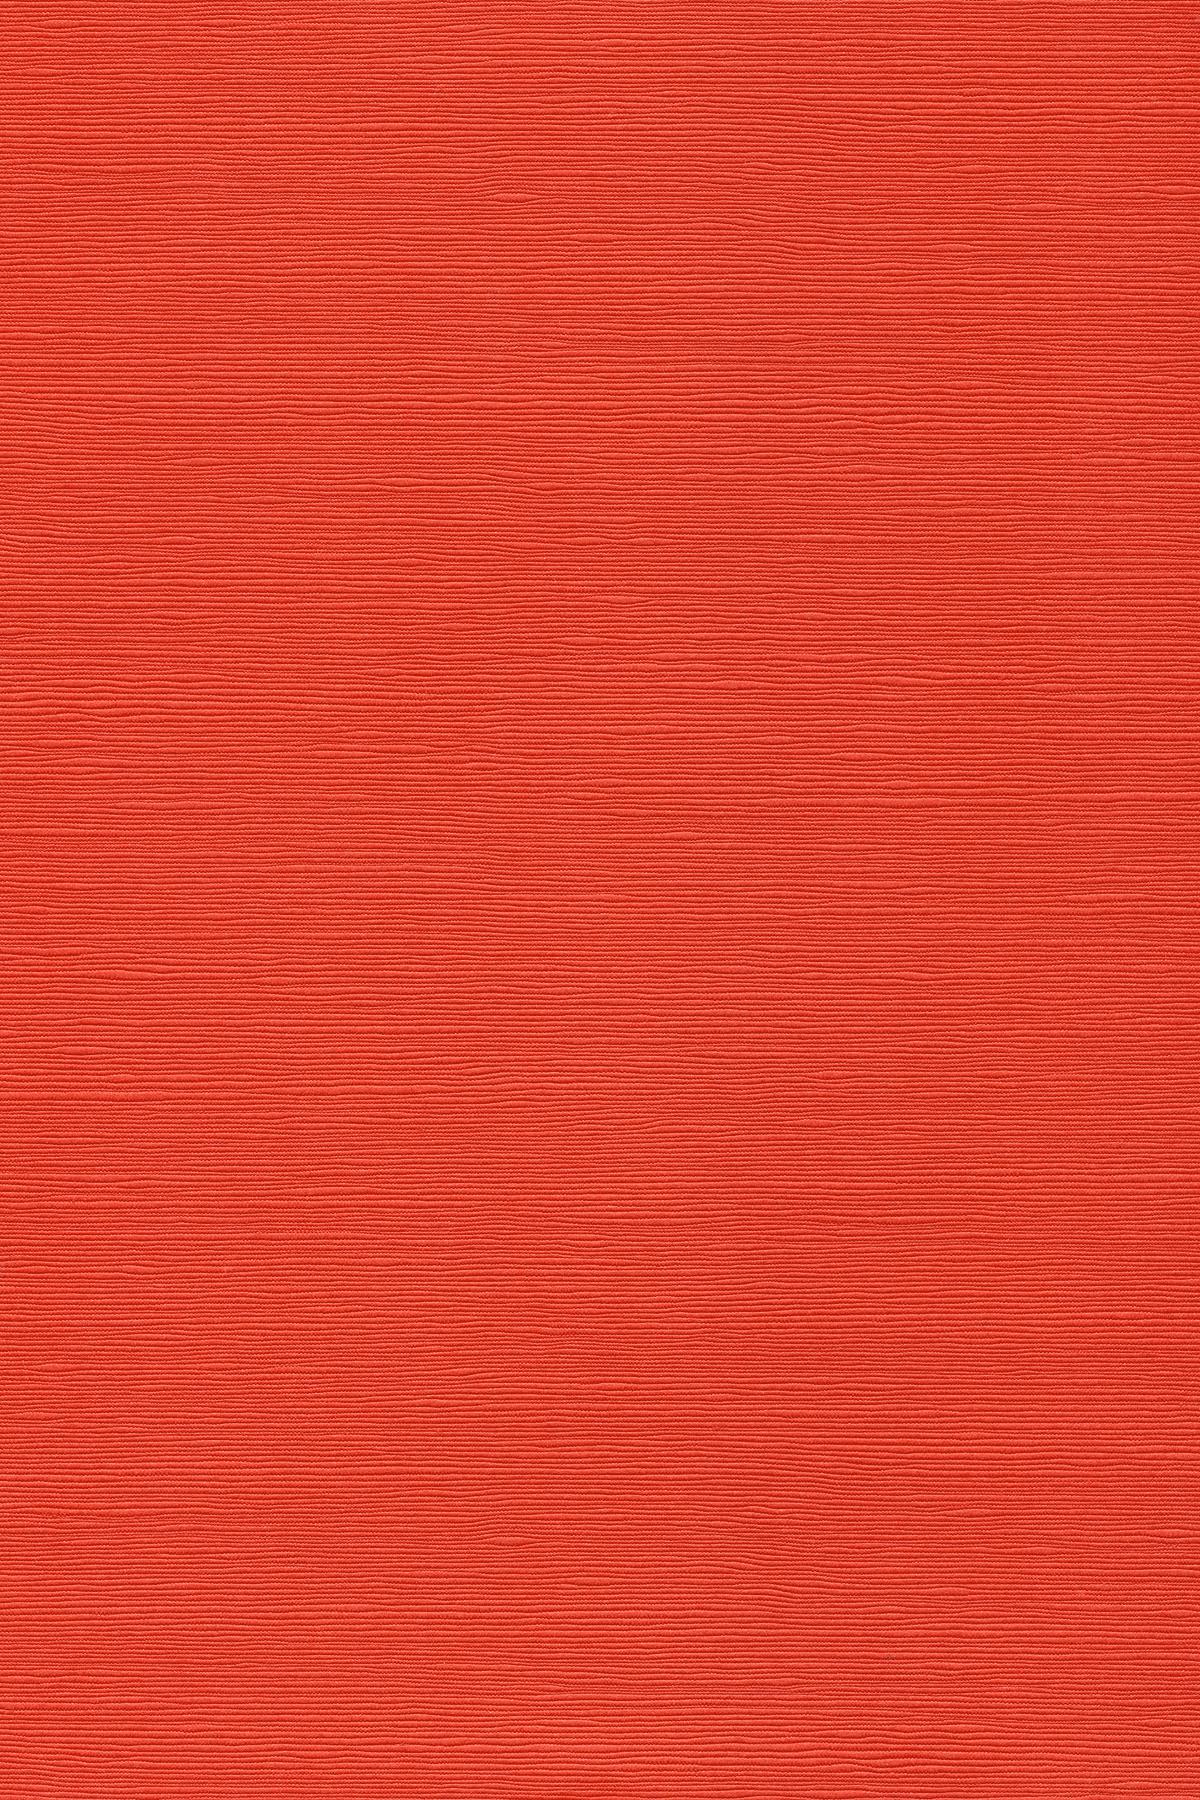 Japanese linen paper - orange photo